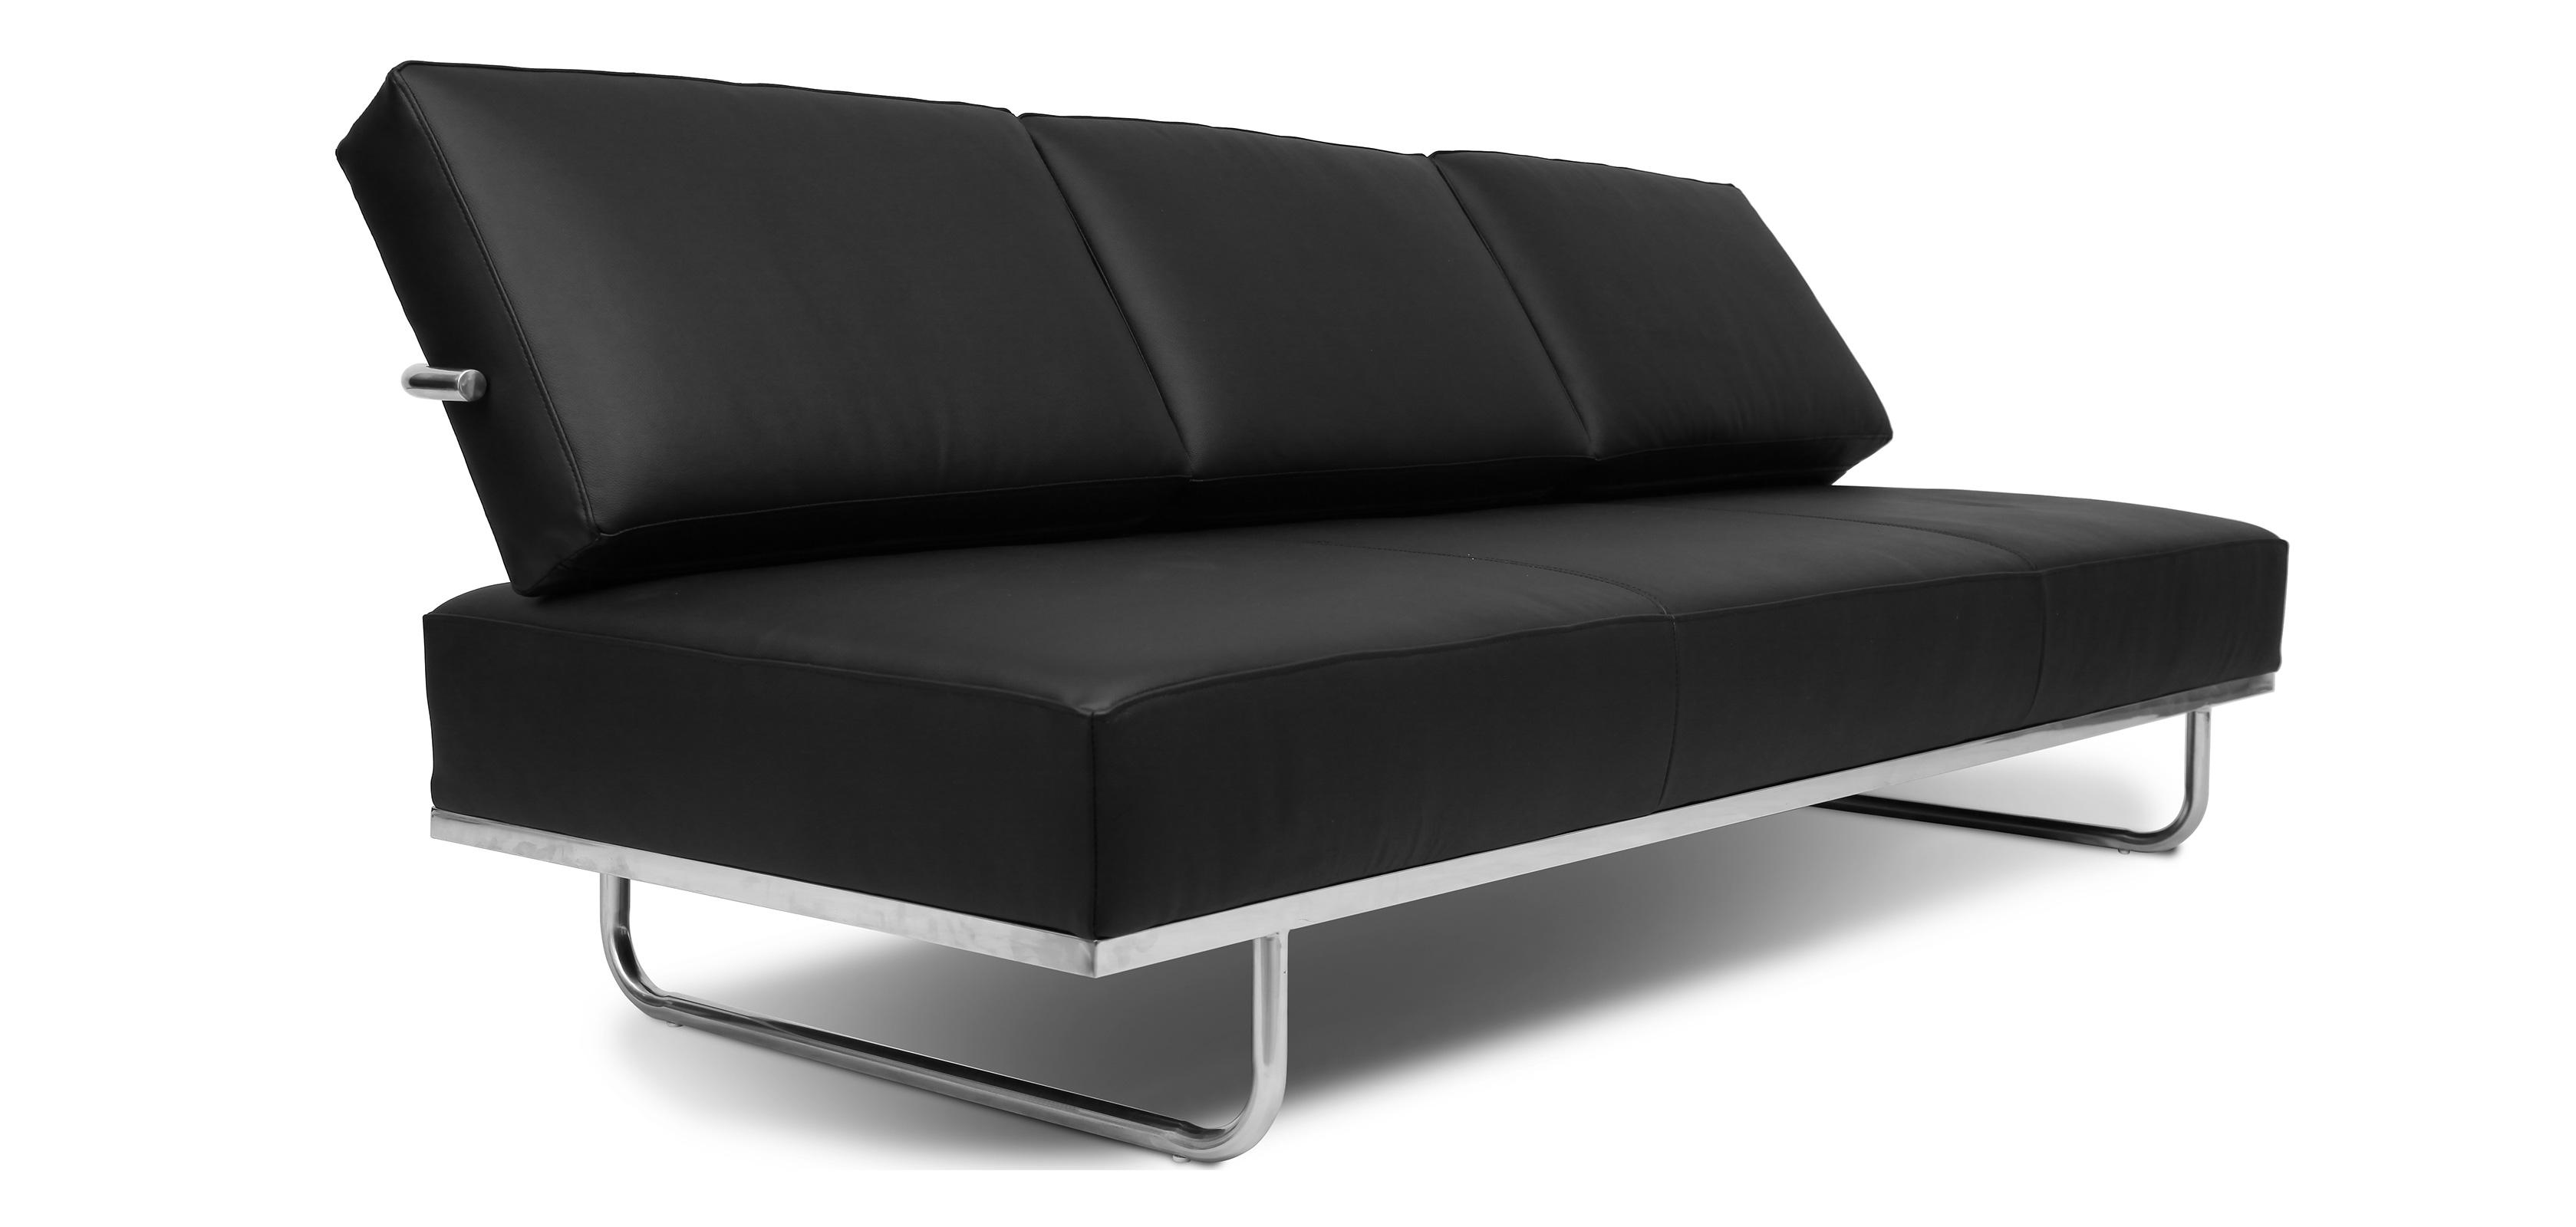 canap lit lc5 charles le corbusier simili cuir. Black Bedroom Furniture Sets. Home Design Ideas